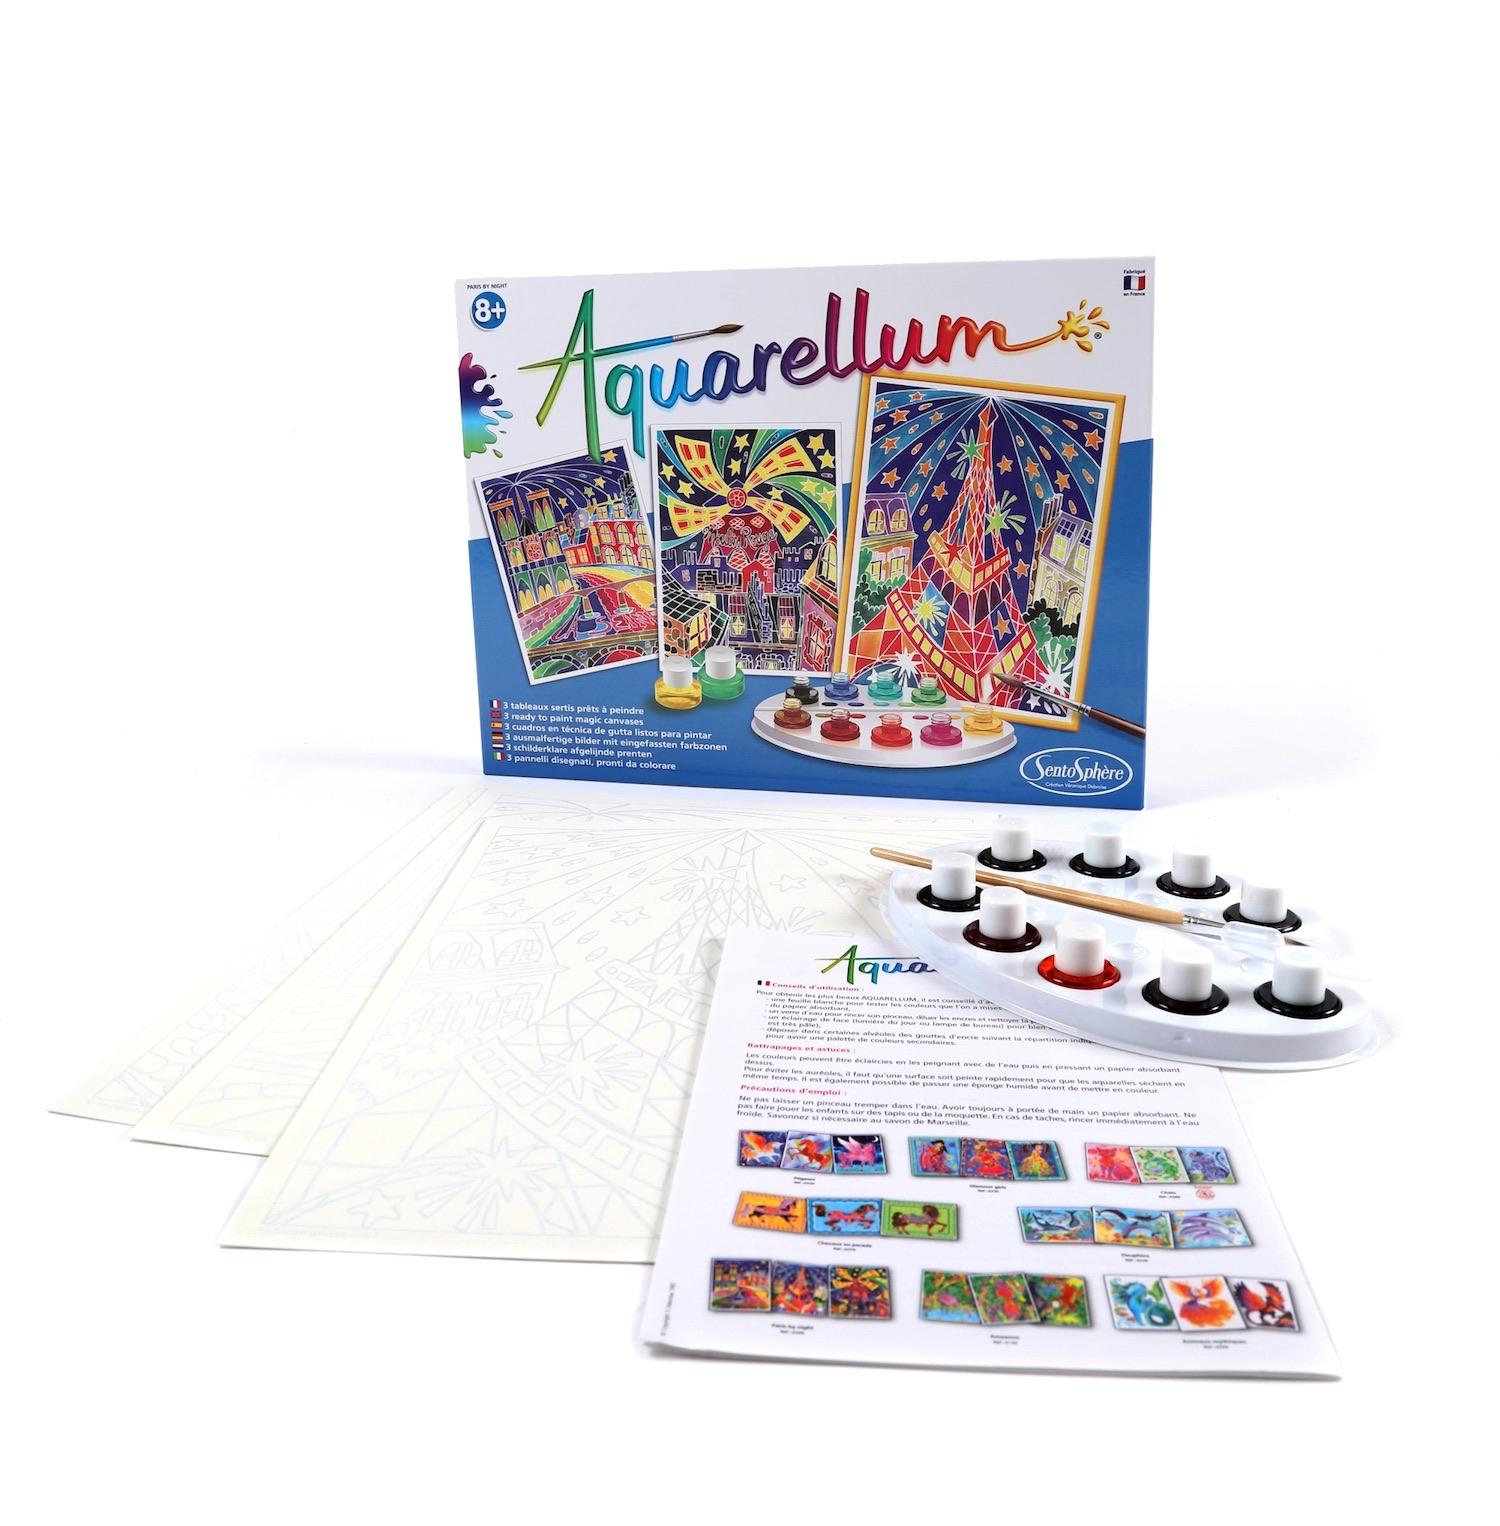 Alternate Aquarellum Parisian Painting Kit image 0